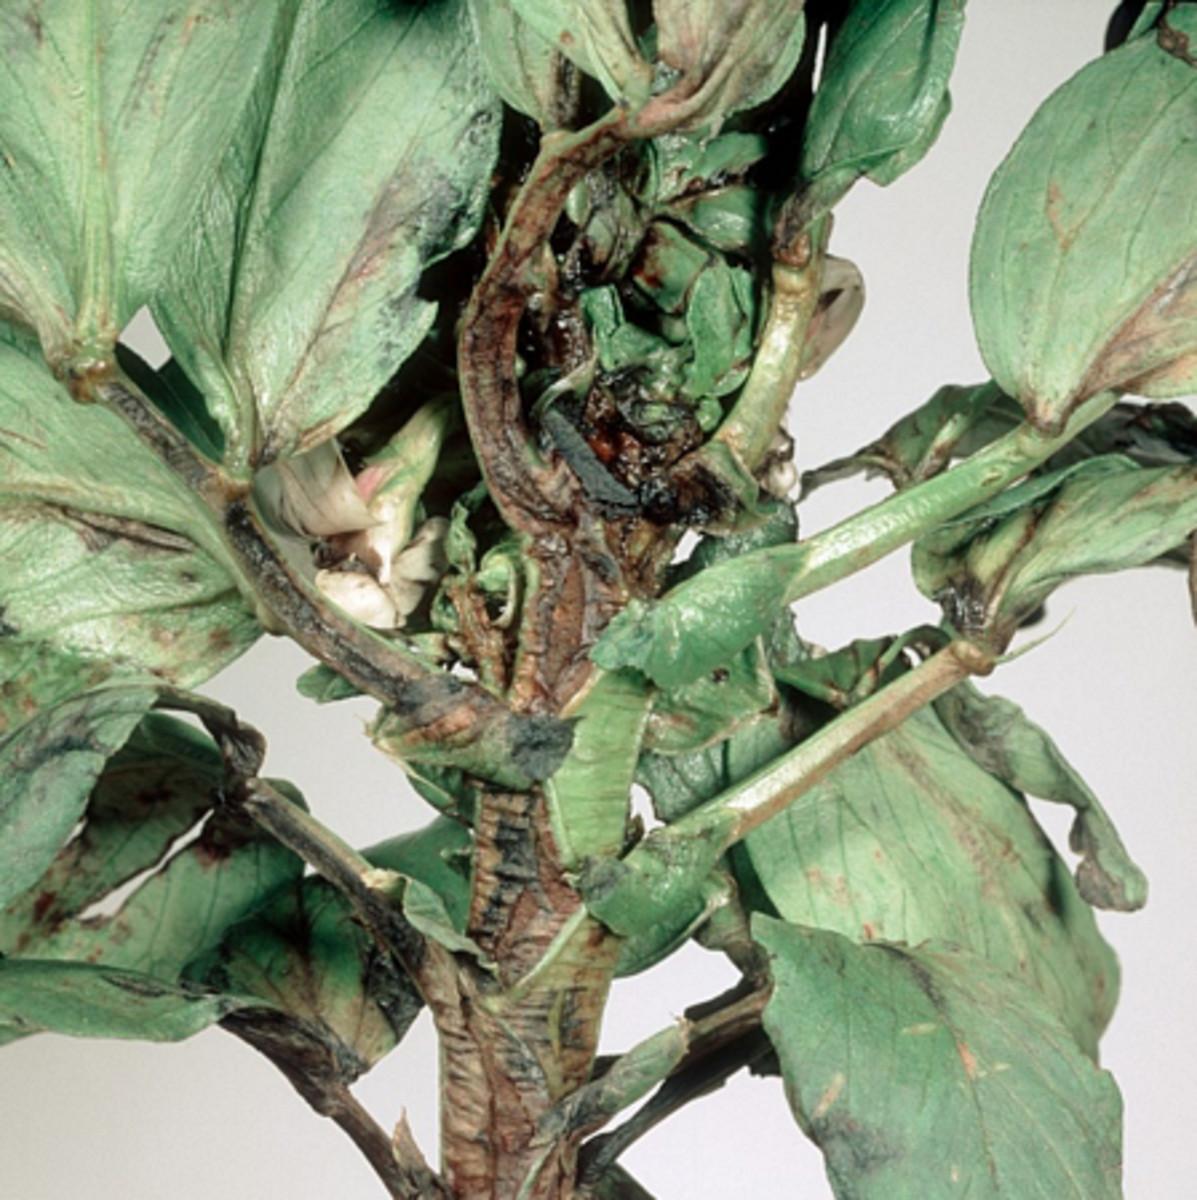 Stem & bulb eelworm damage to bean stem